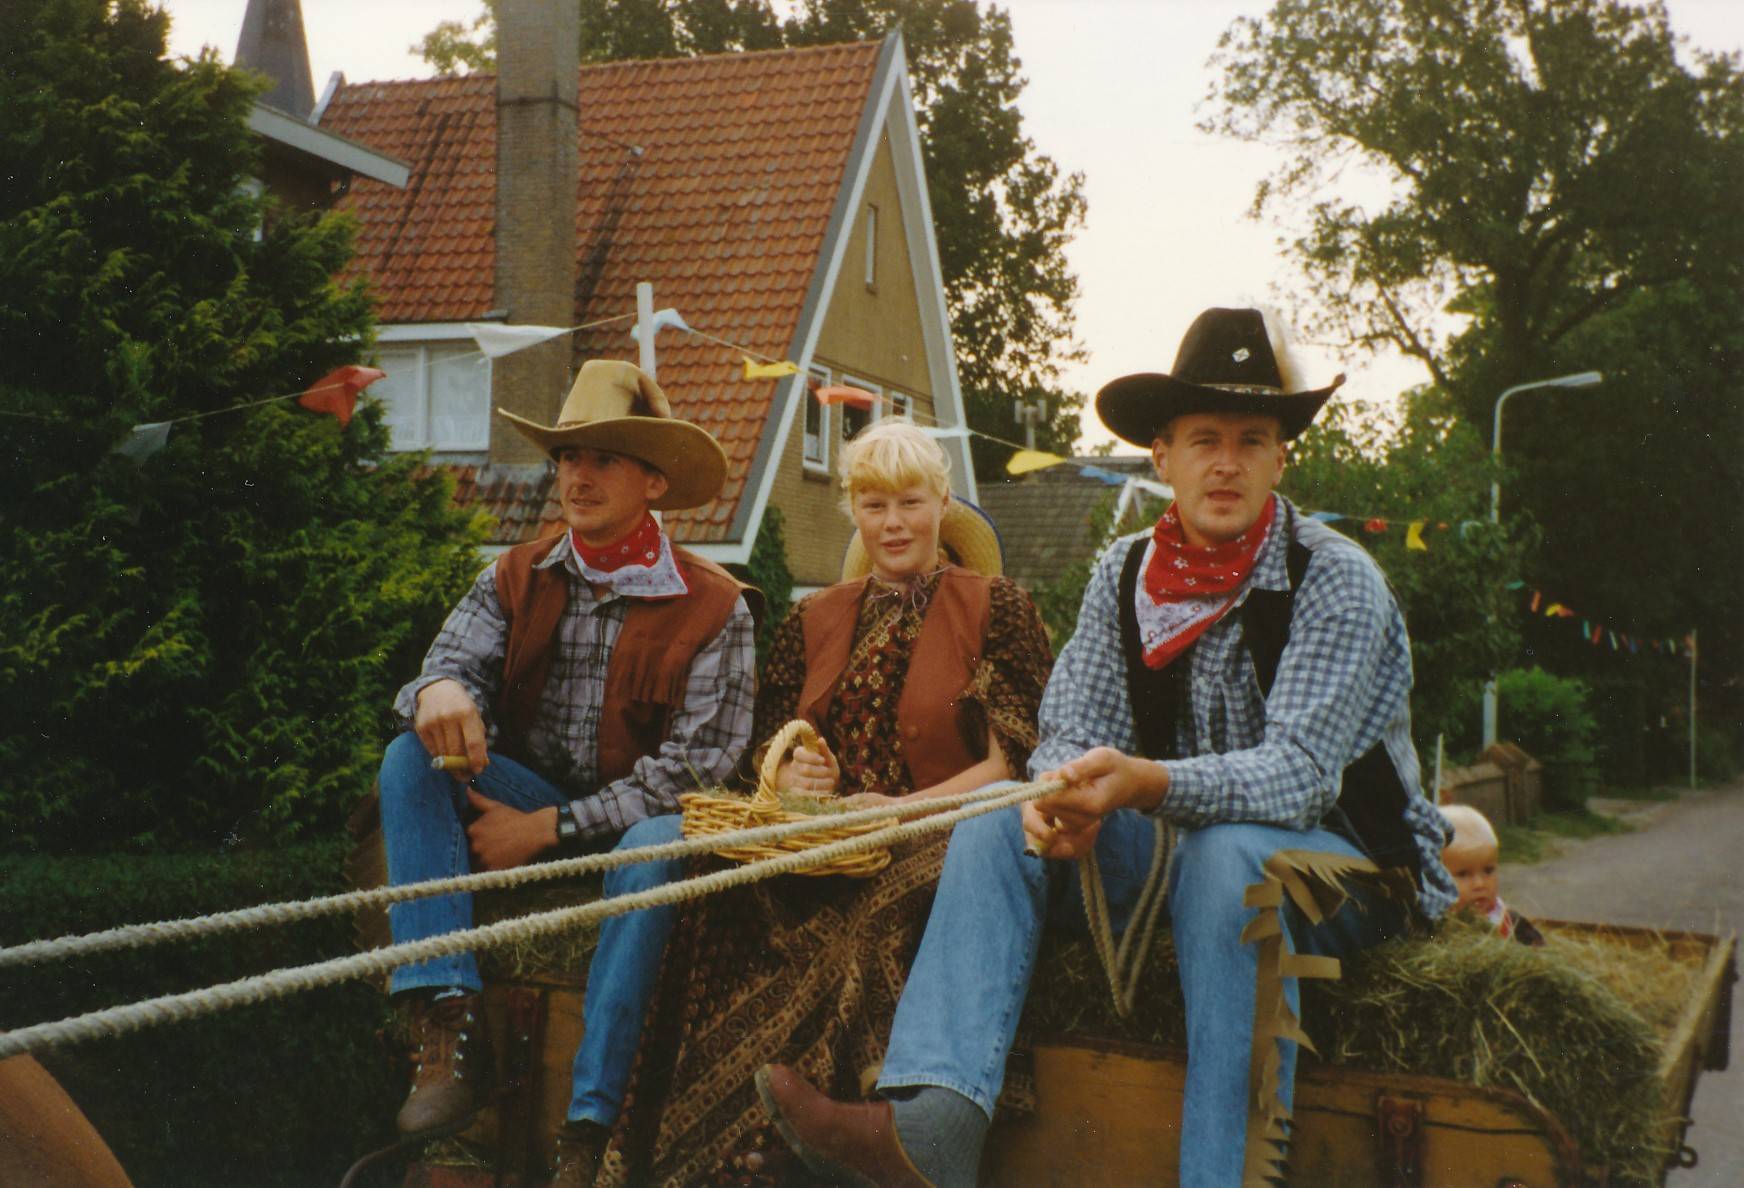 Fotoalbum Anneke Miedema, 009, Merke 1994, augustus, Frits Miedema, Baukje Boersma en Cor Miedema